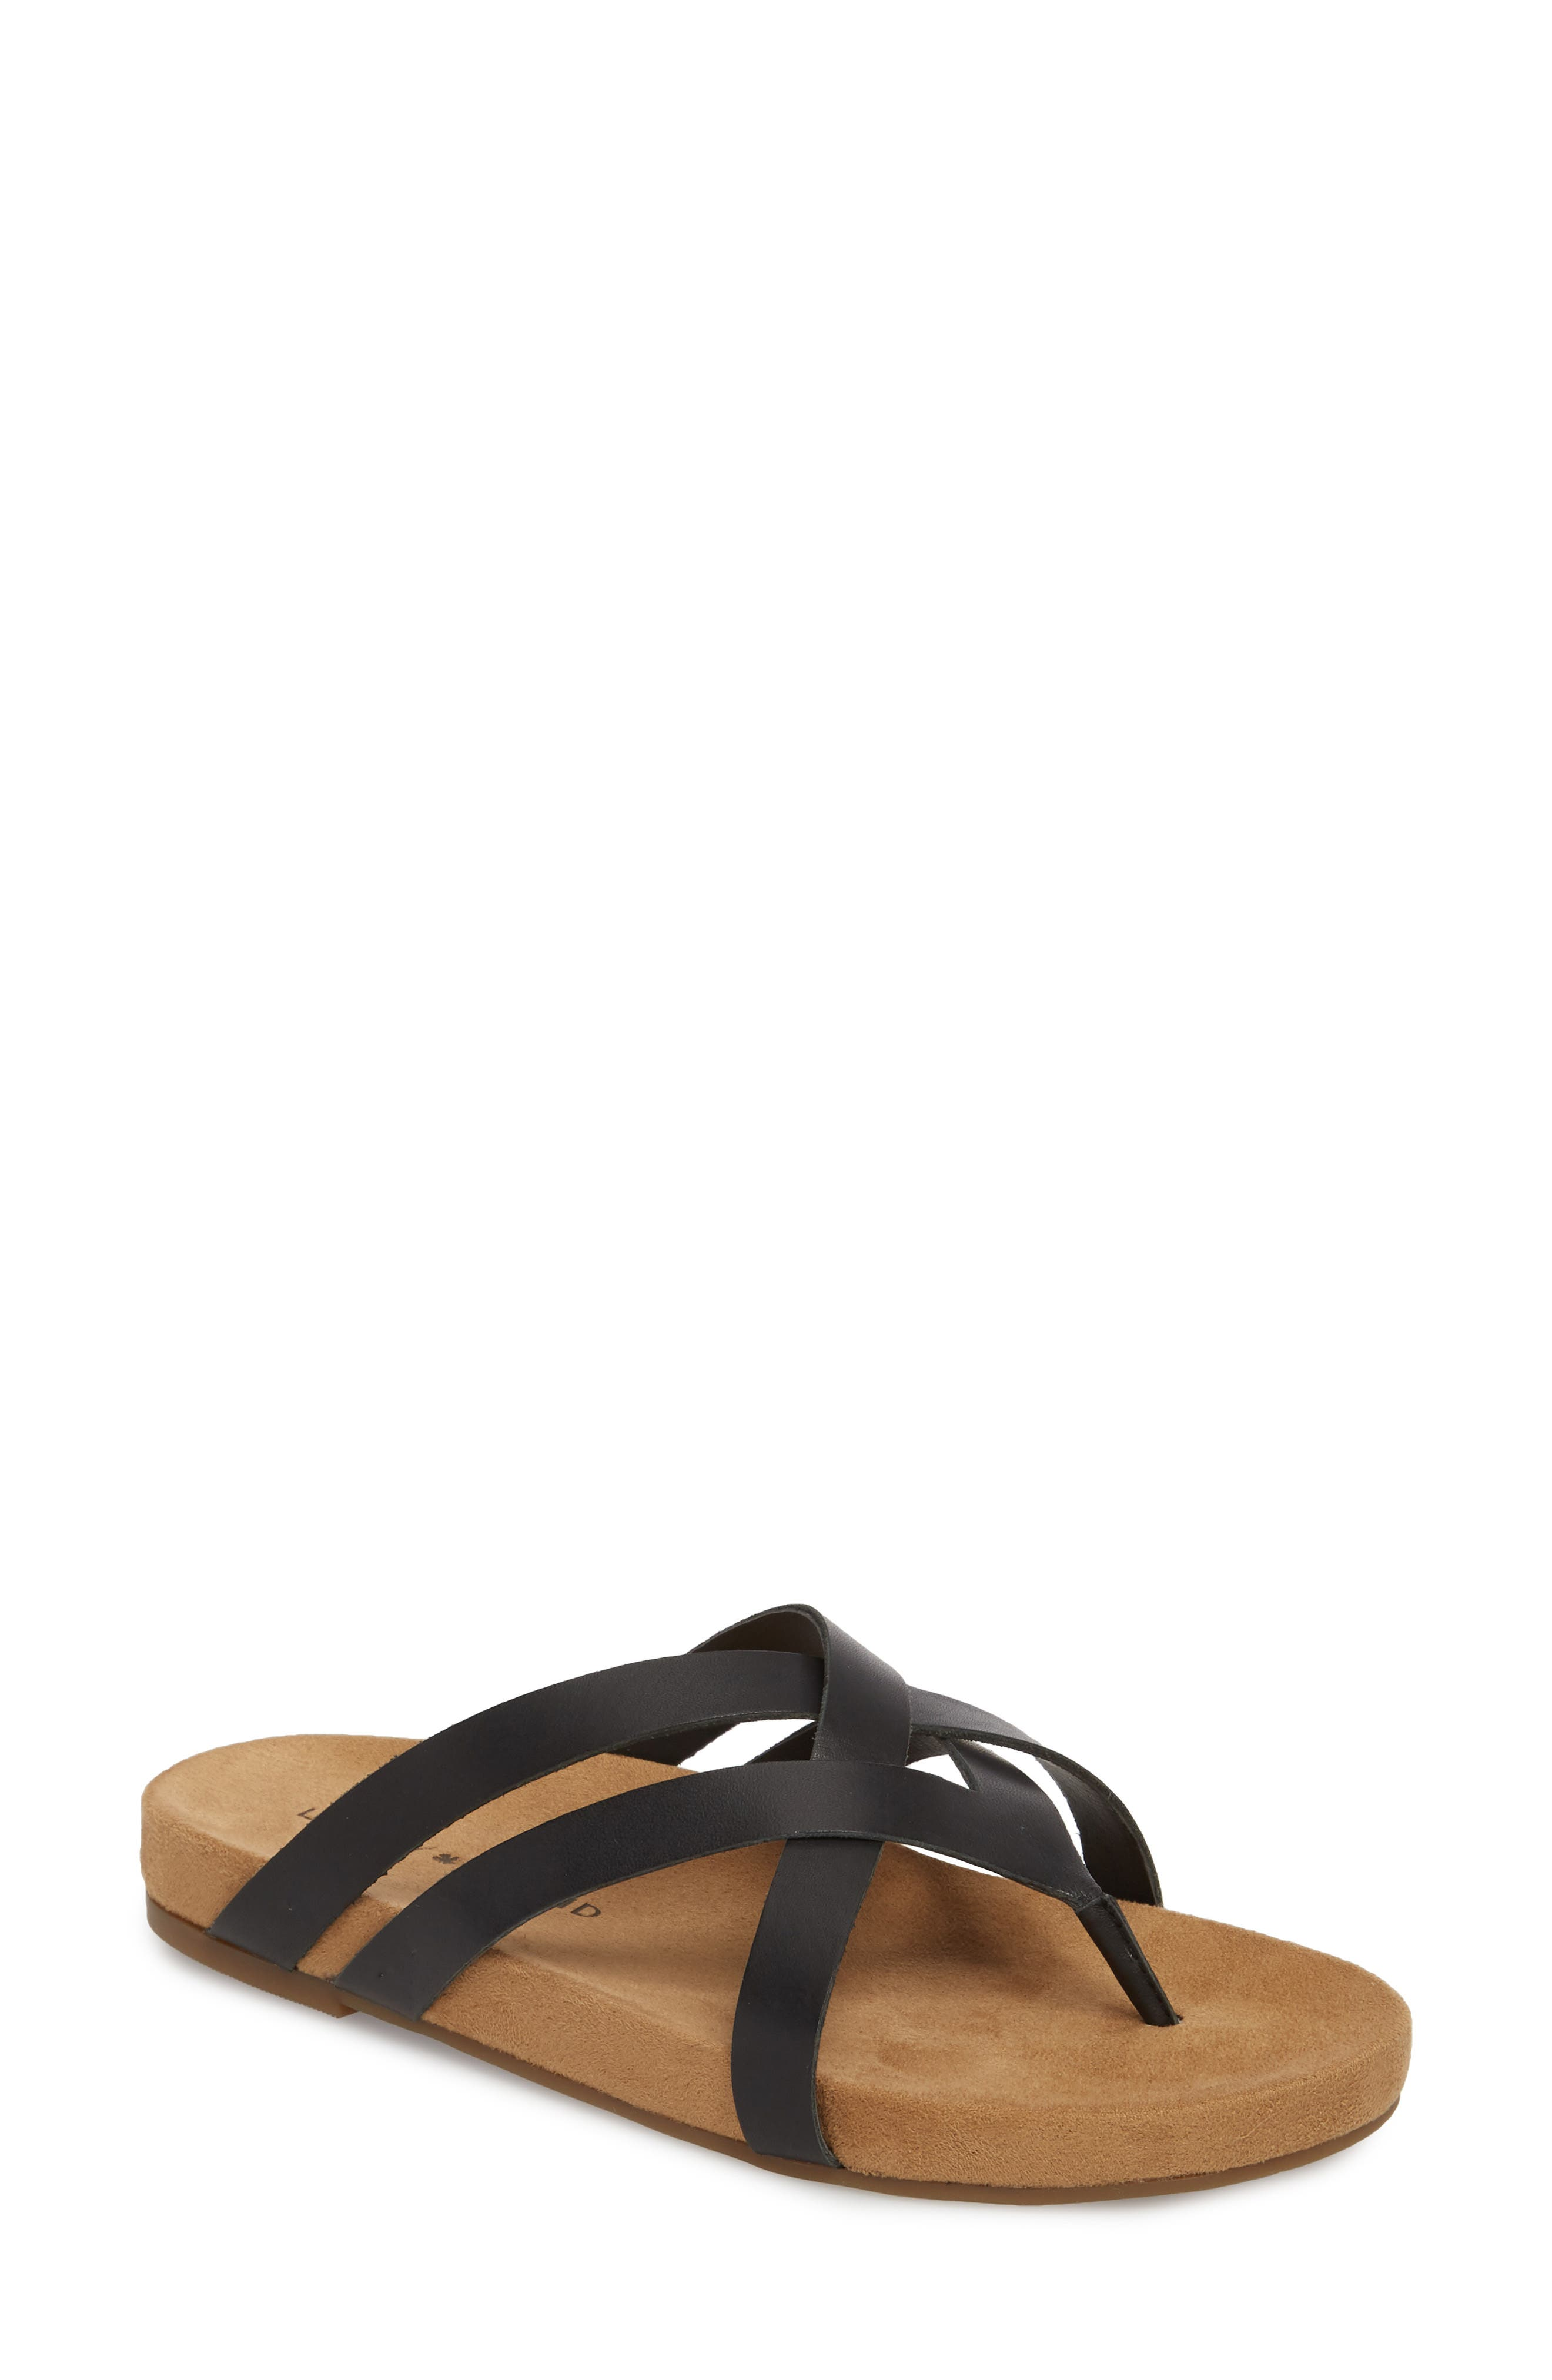 Fillima Flip Flop,                         Main,                         color, Black Leather